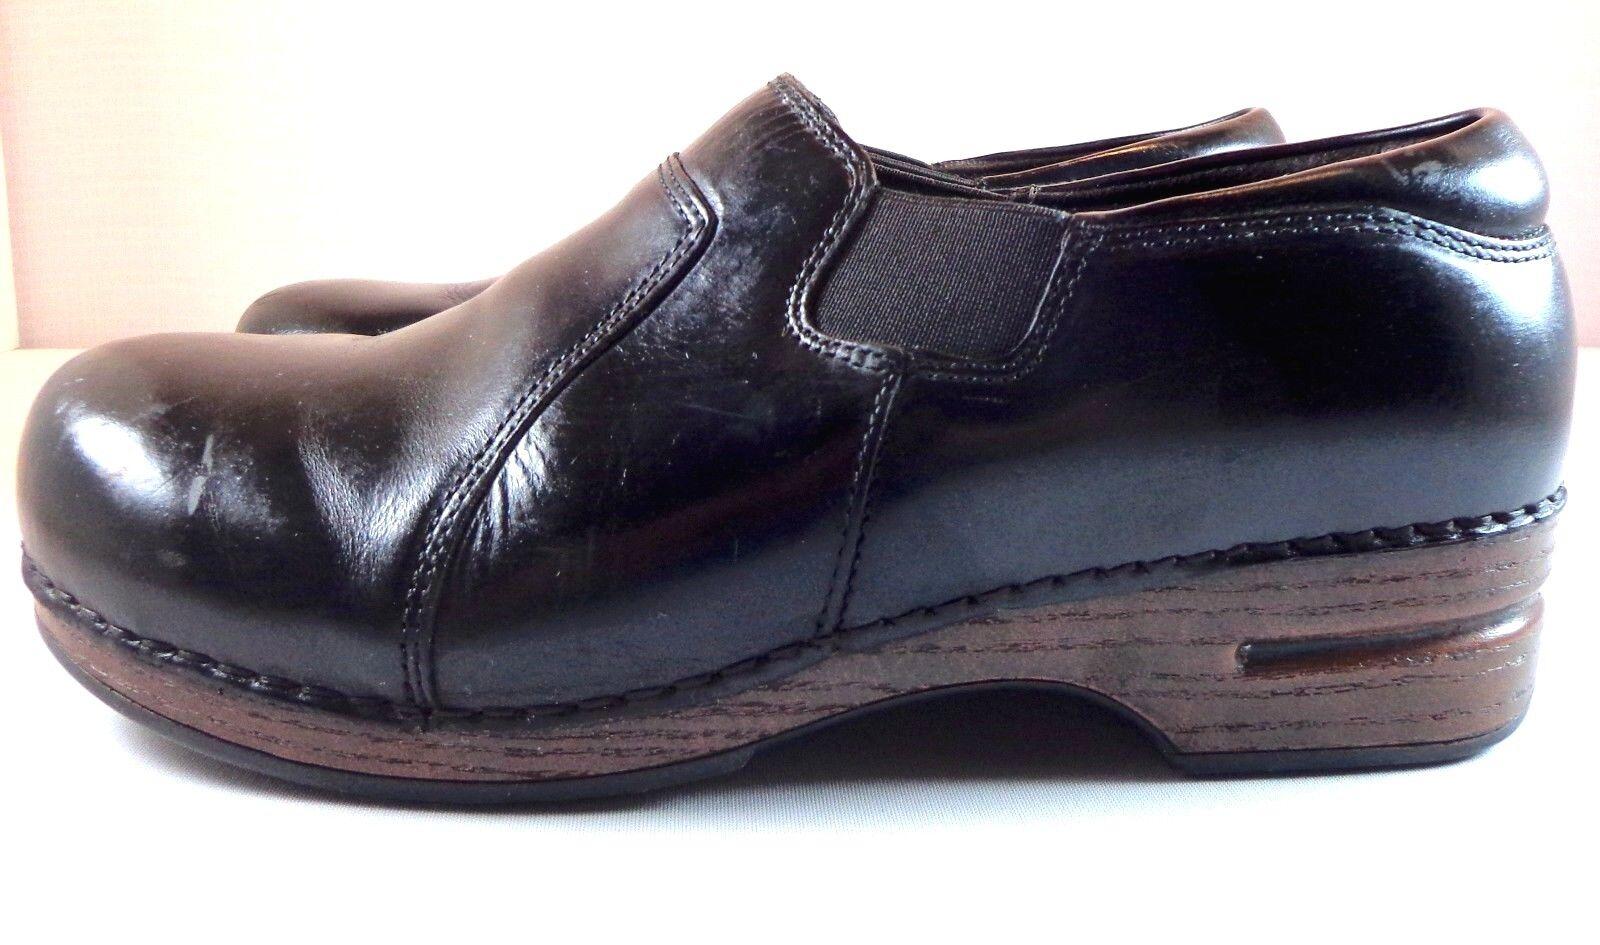 Womens Dansko XP Clogs Black Leather Slip On Shoes Size 42 42 Size (US 11.5 - 12) 472275